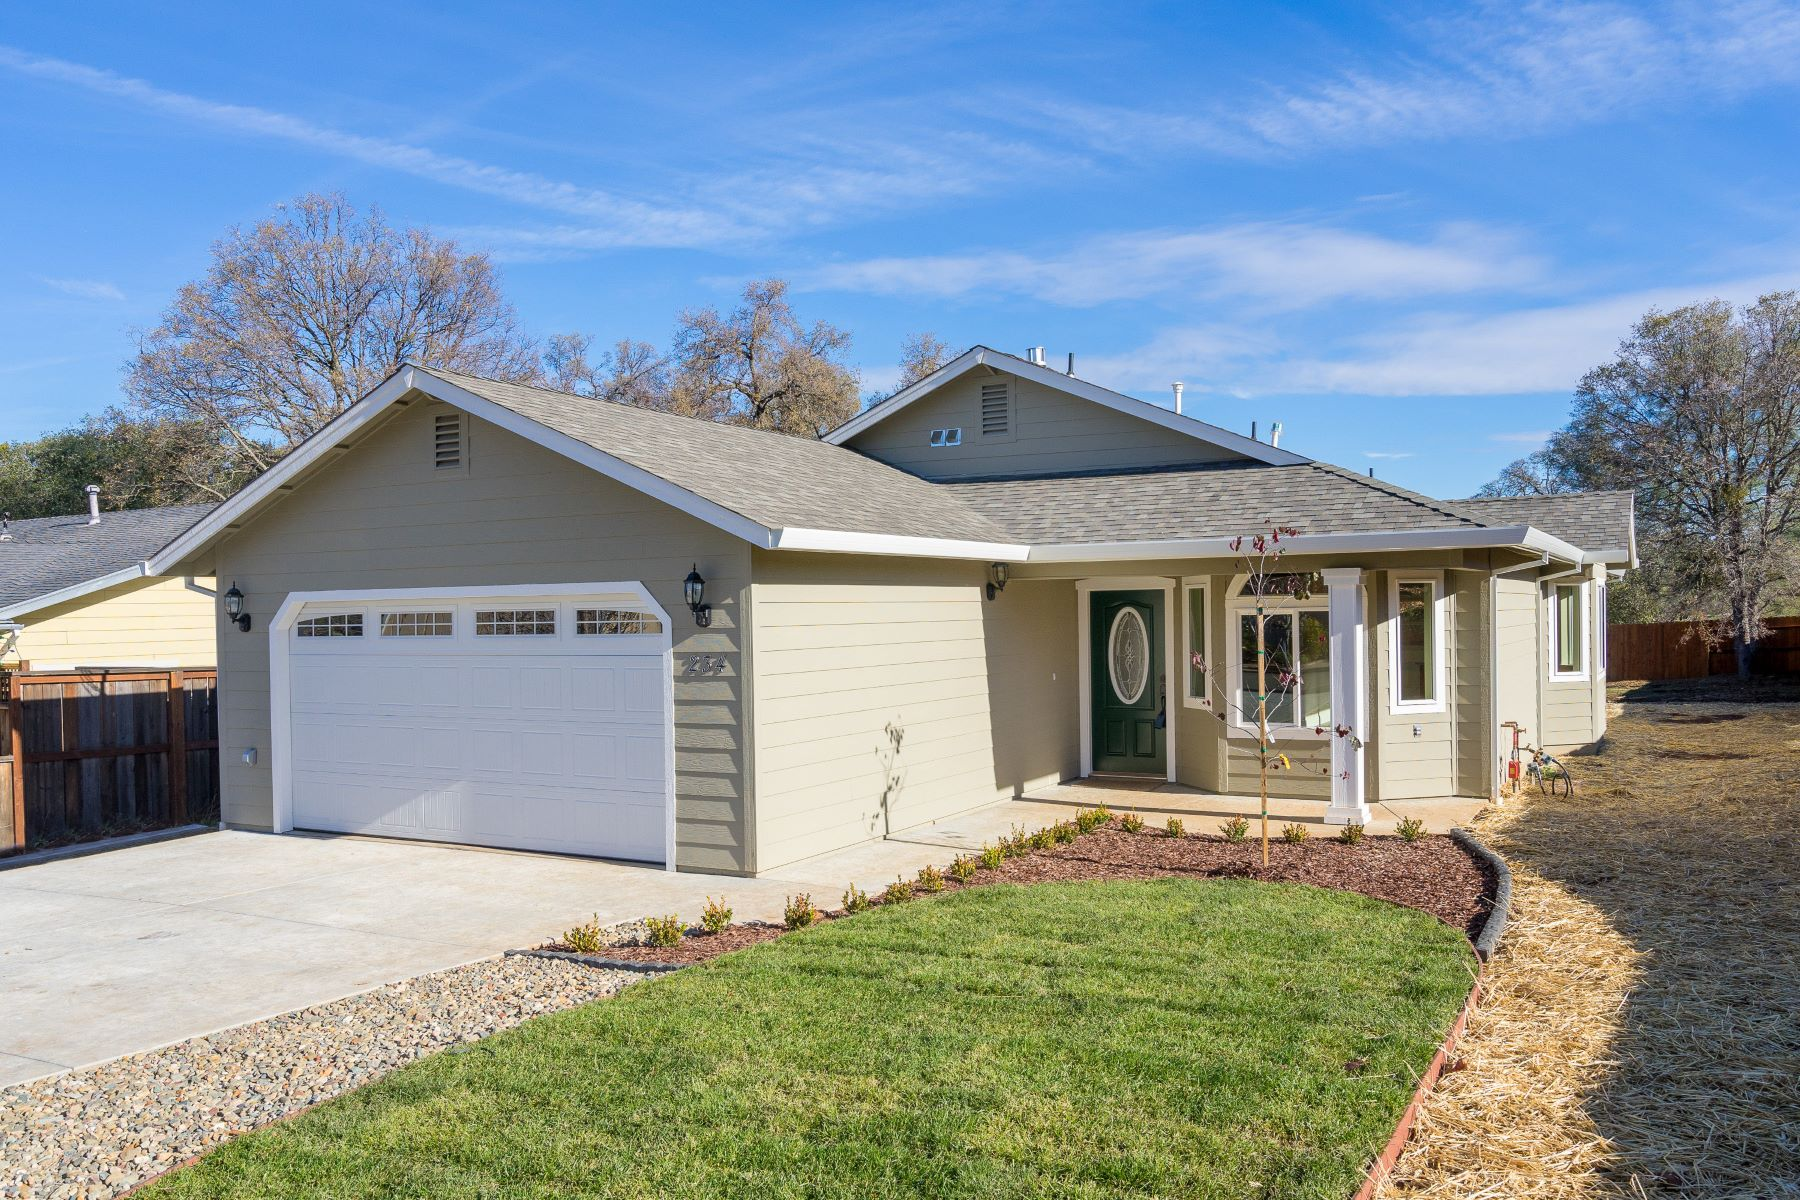 独户住宅 为 销售 在 New Construction in Sutter Creek 234 Foothill Drive Sutter Creek, 加利福尼亚州 95685 美国